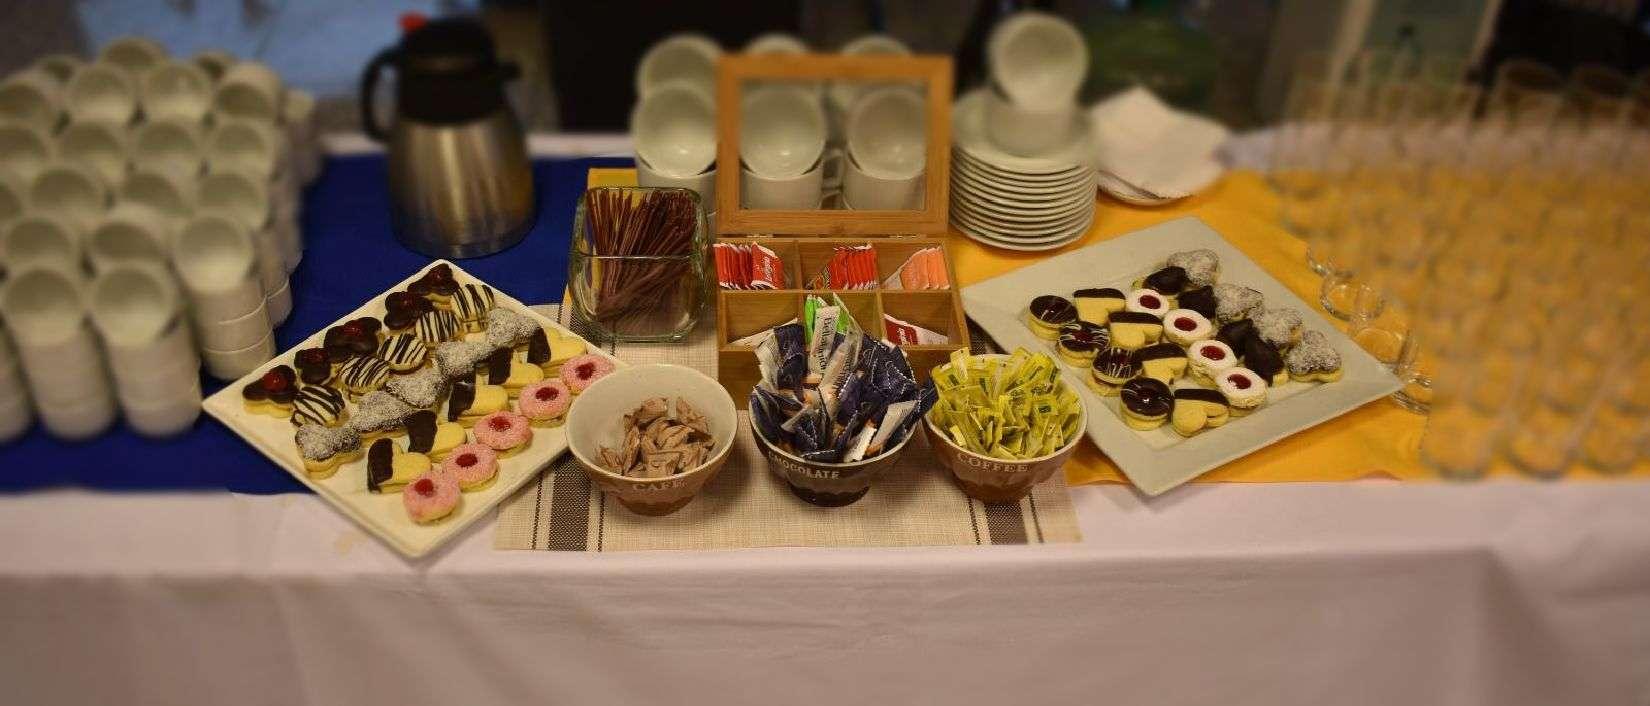 acuaria catering, eventos